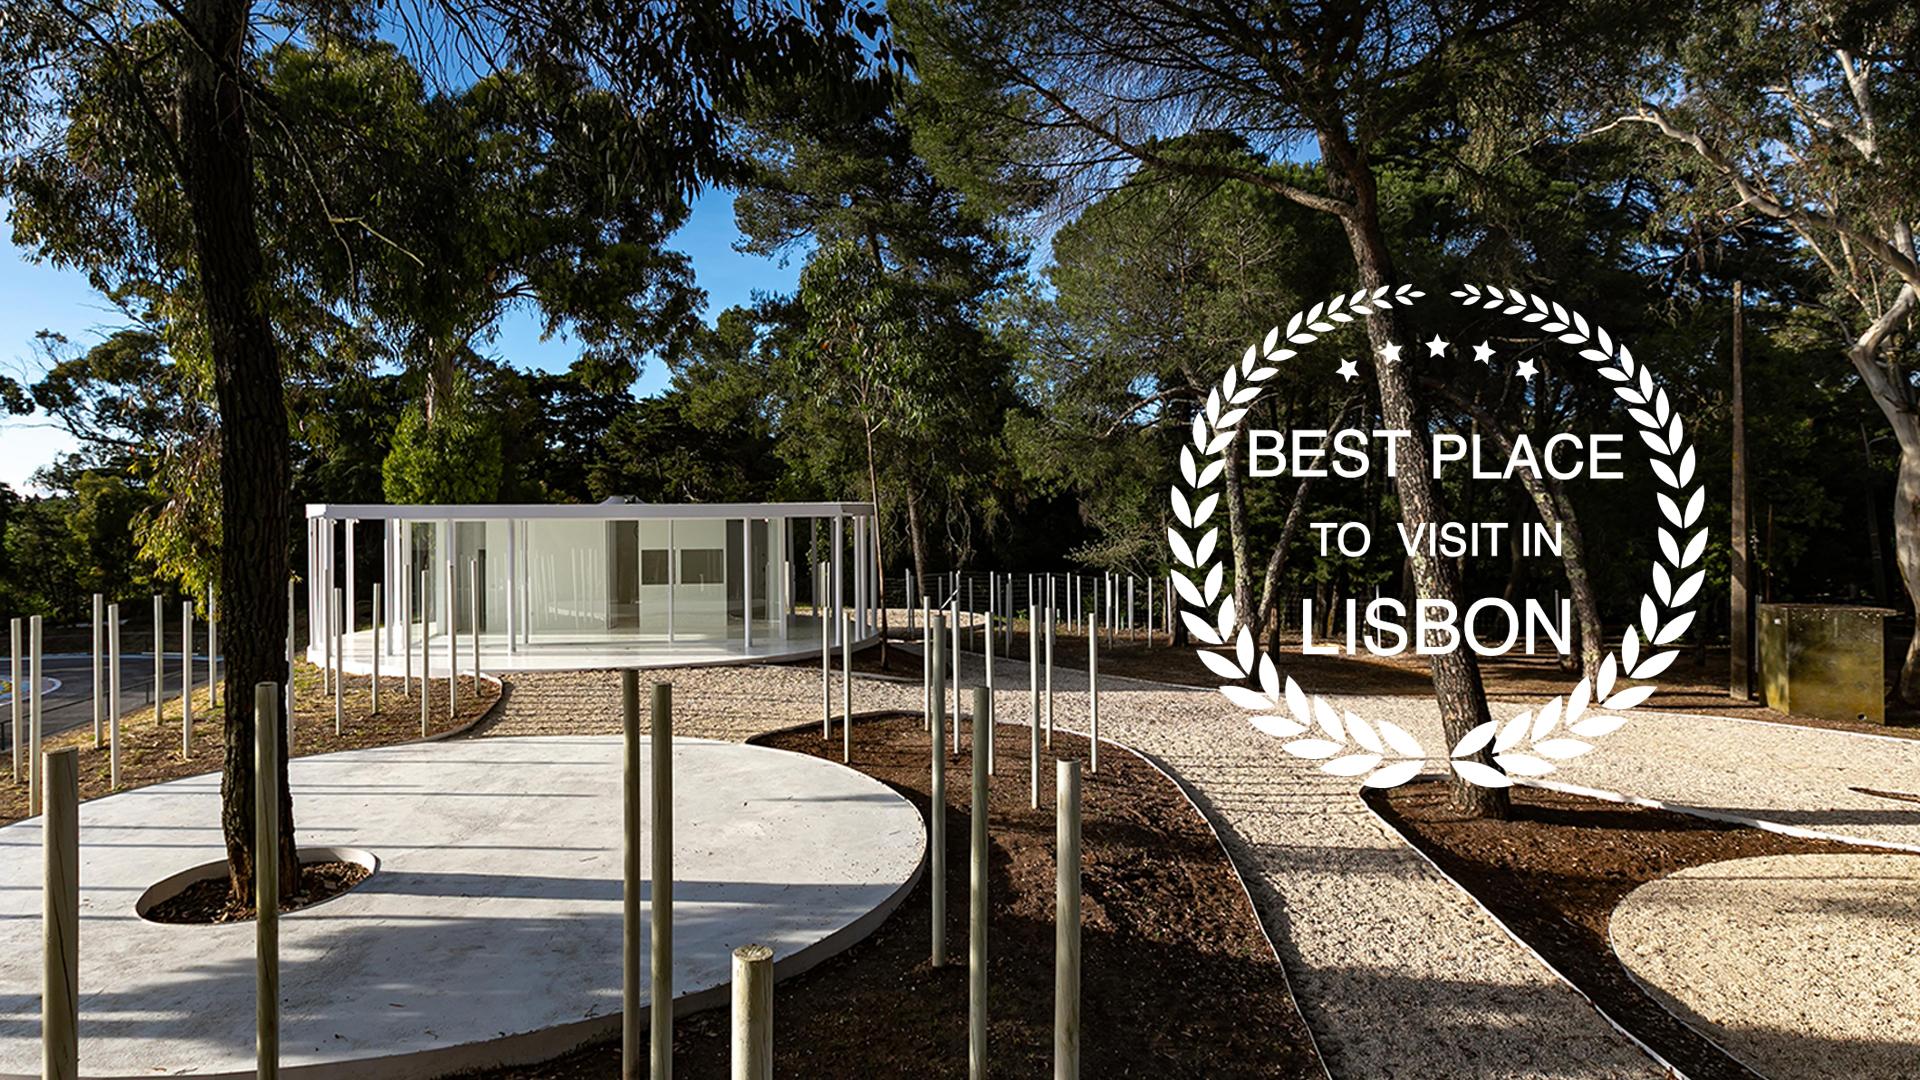 Building to vist in Lisbon, Monsanto